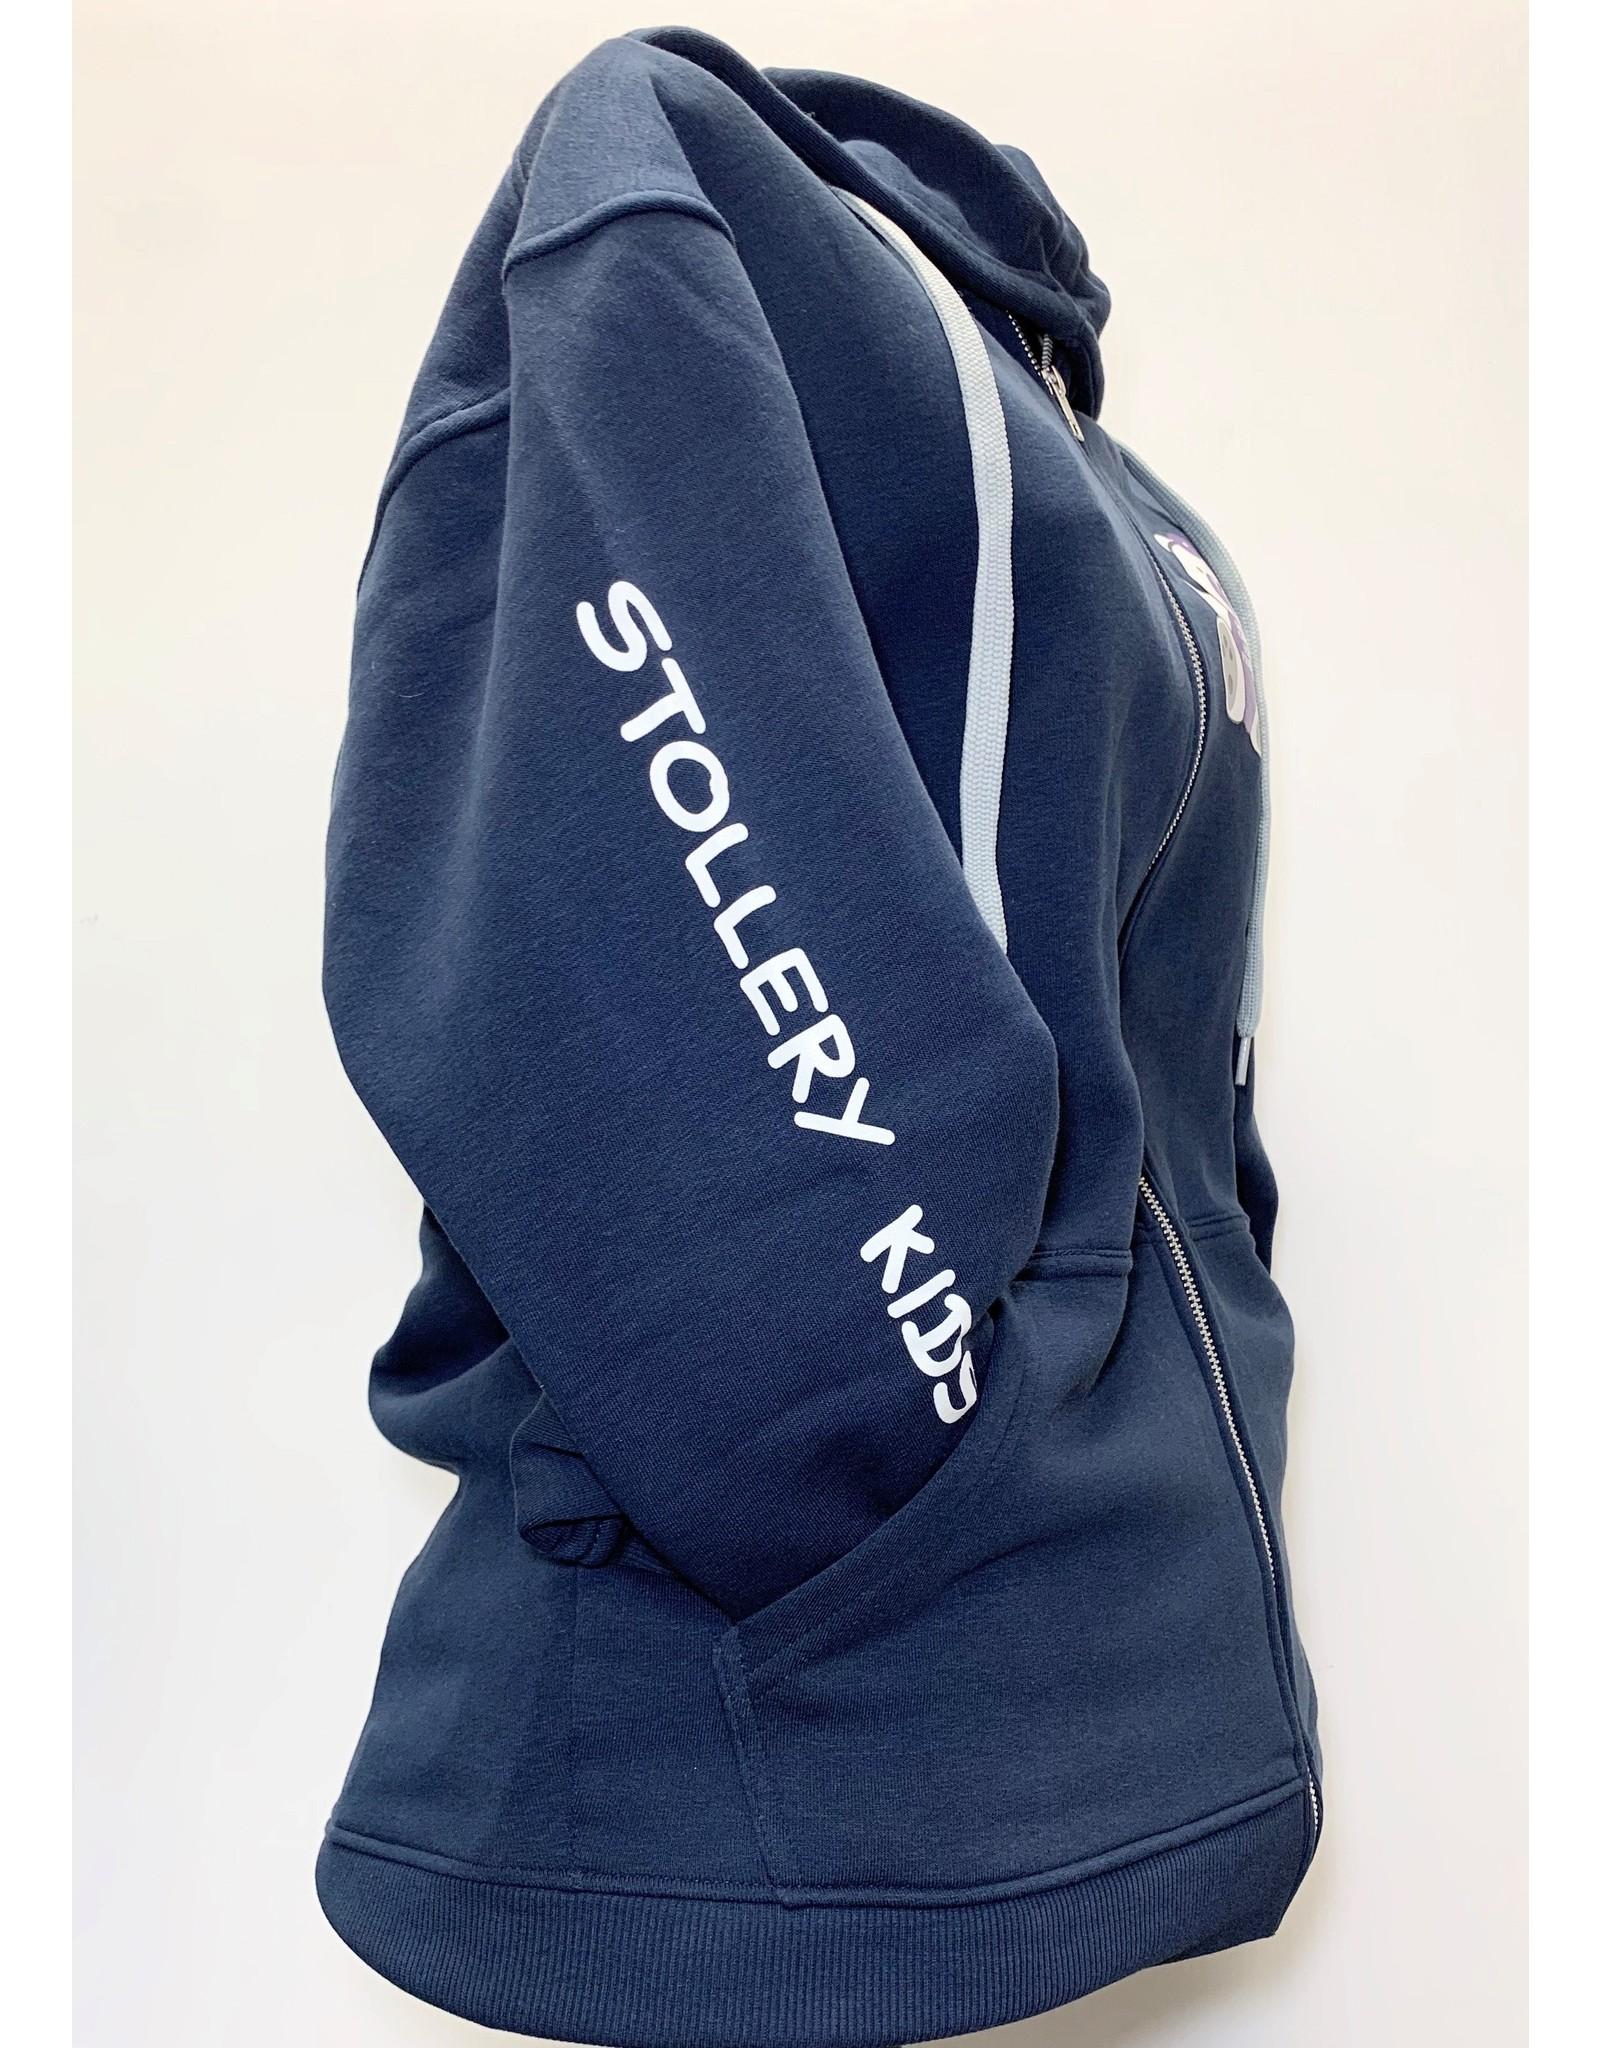 Stollery Adult Hoodie Fleece